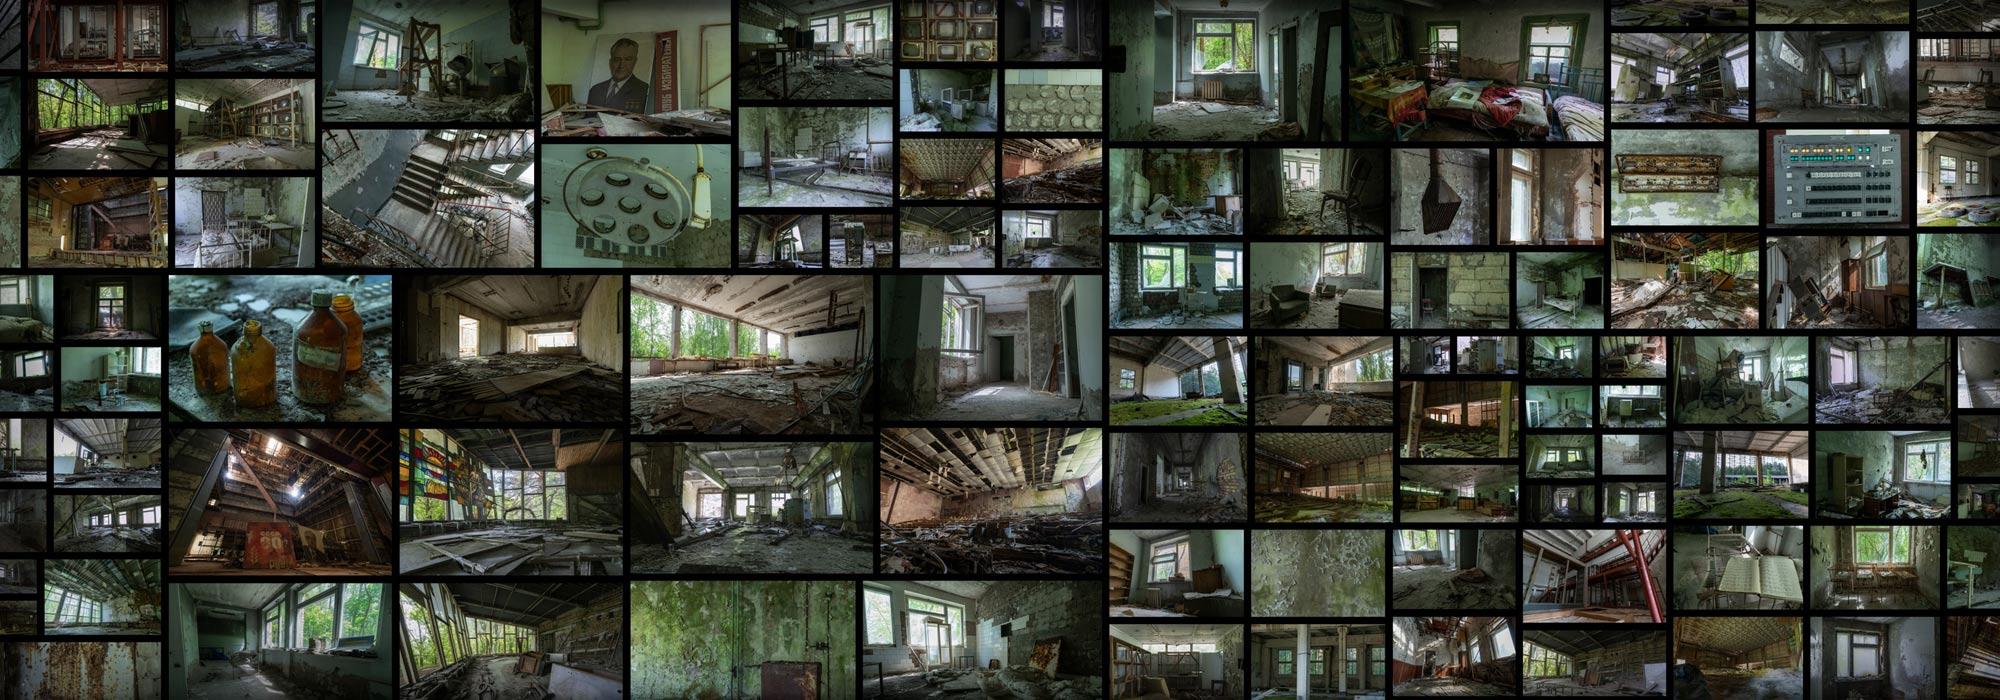 Pripyat  Interiors Radioactive Abandoned Chernobyl Town